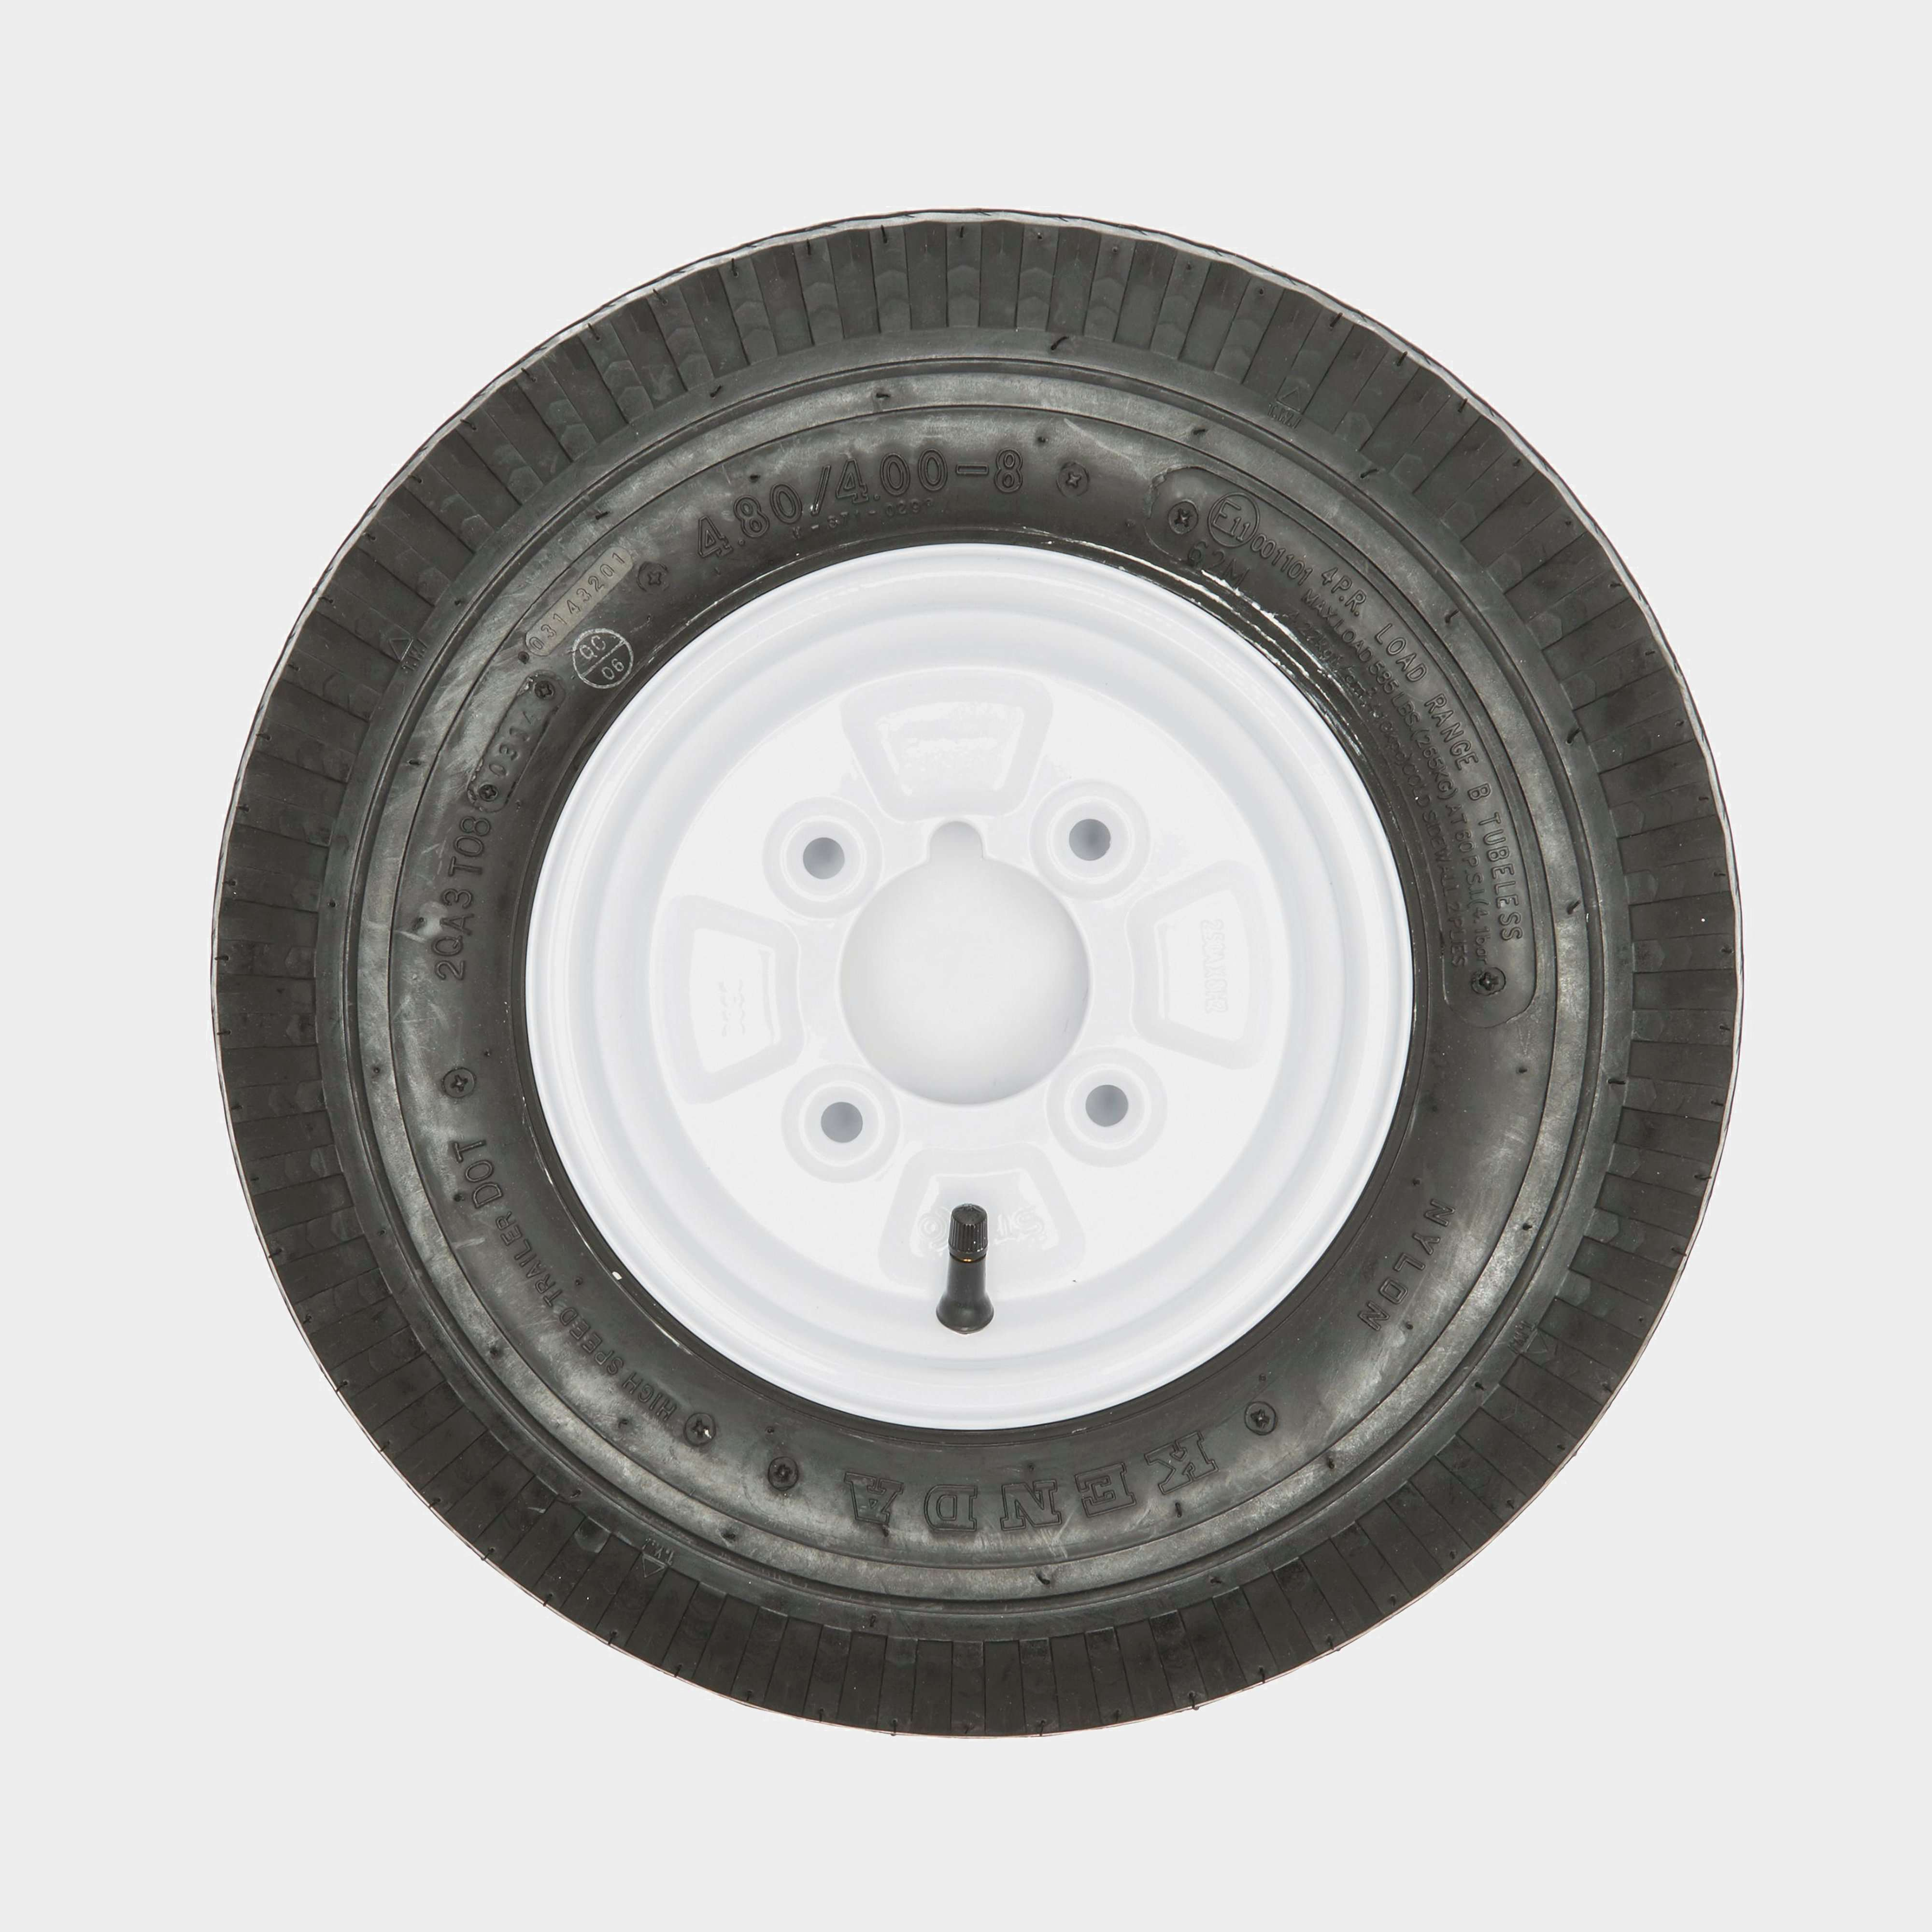 MAYPOLE Trailer Wheel and Tyre